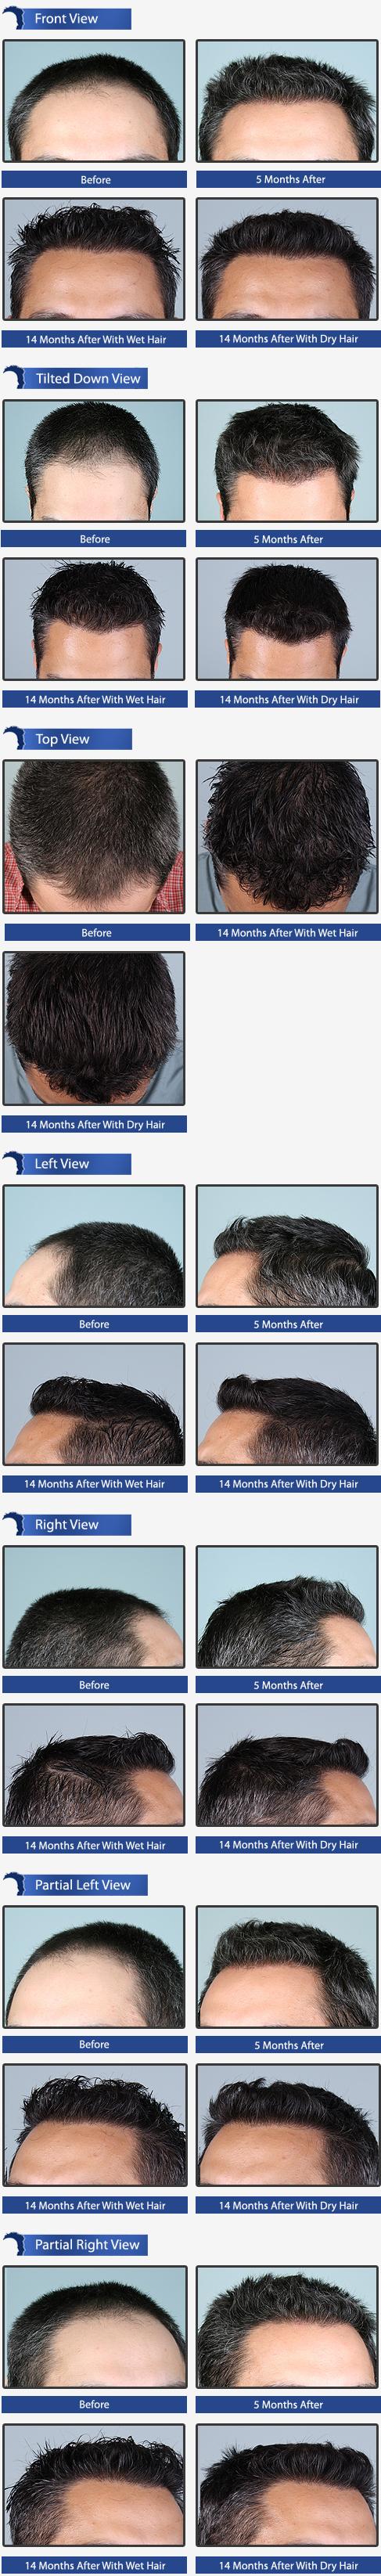 Hair Transplant Surgery Toronto